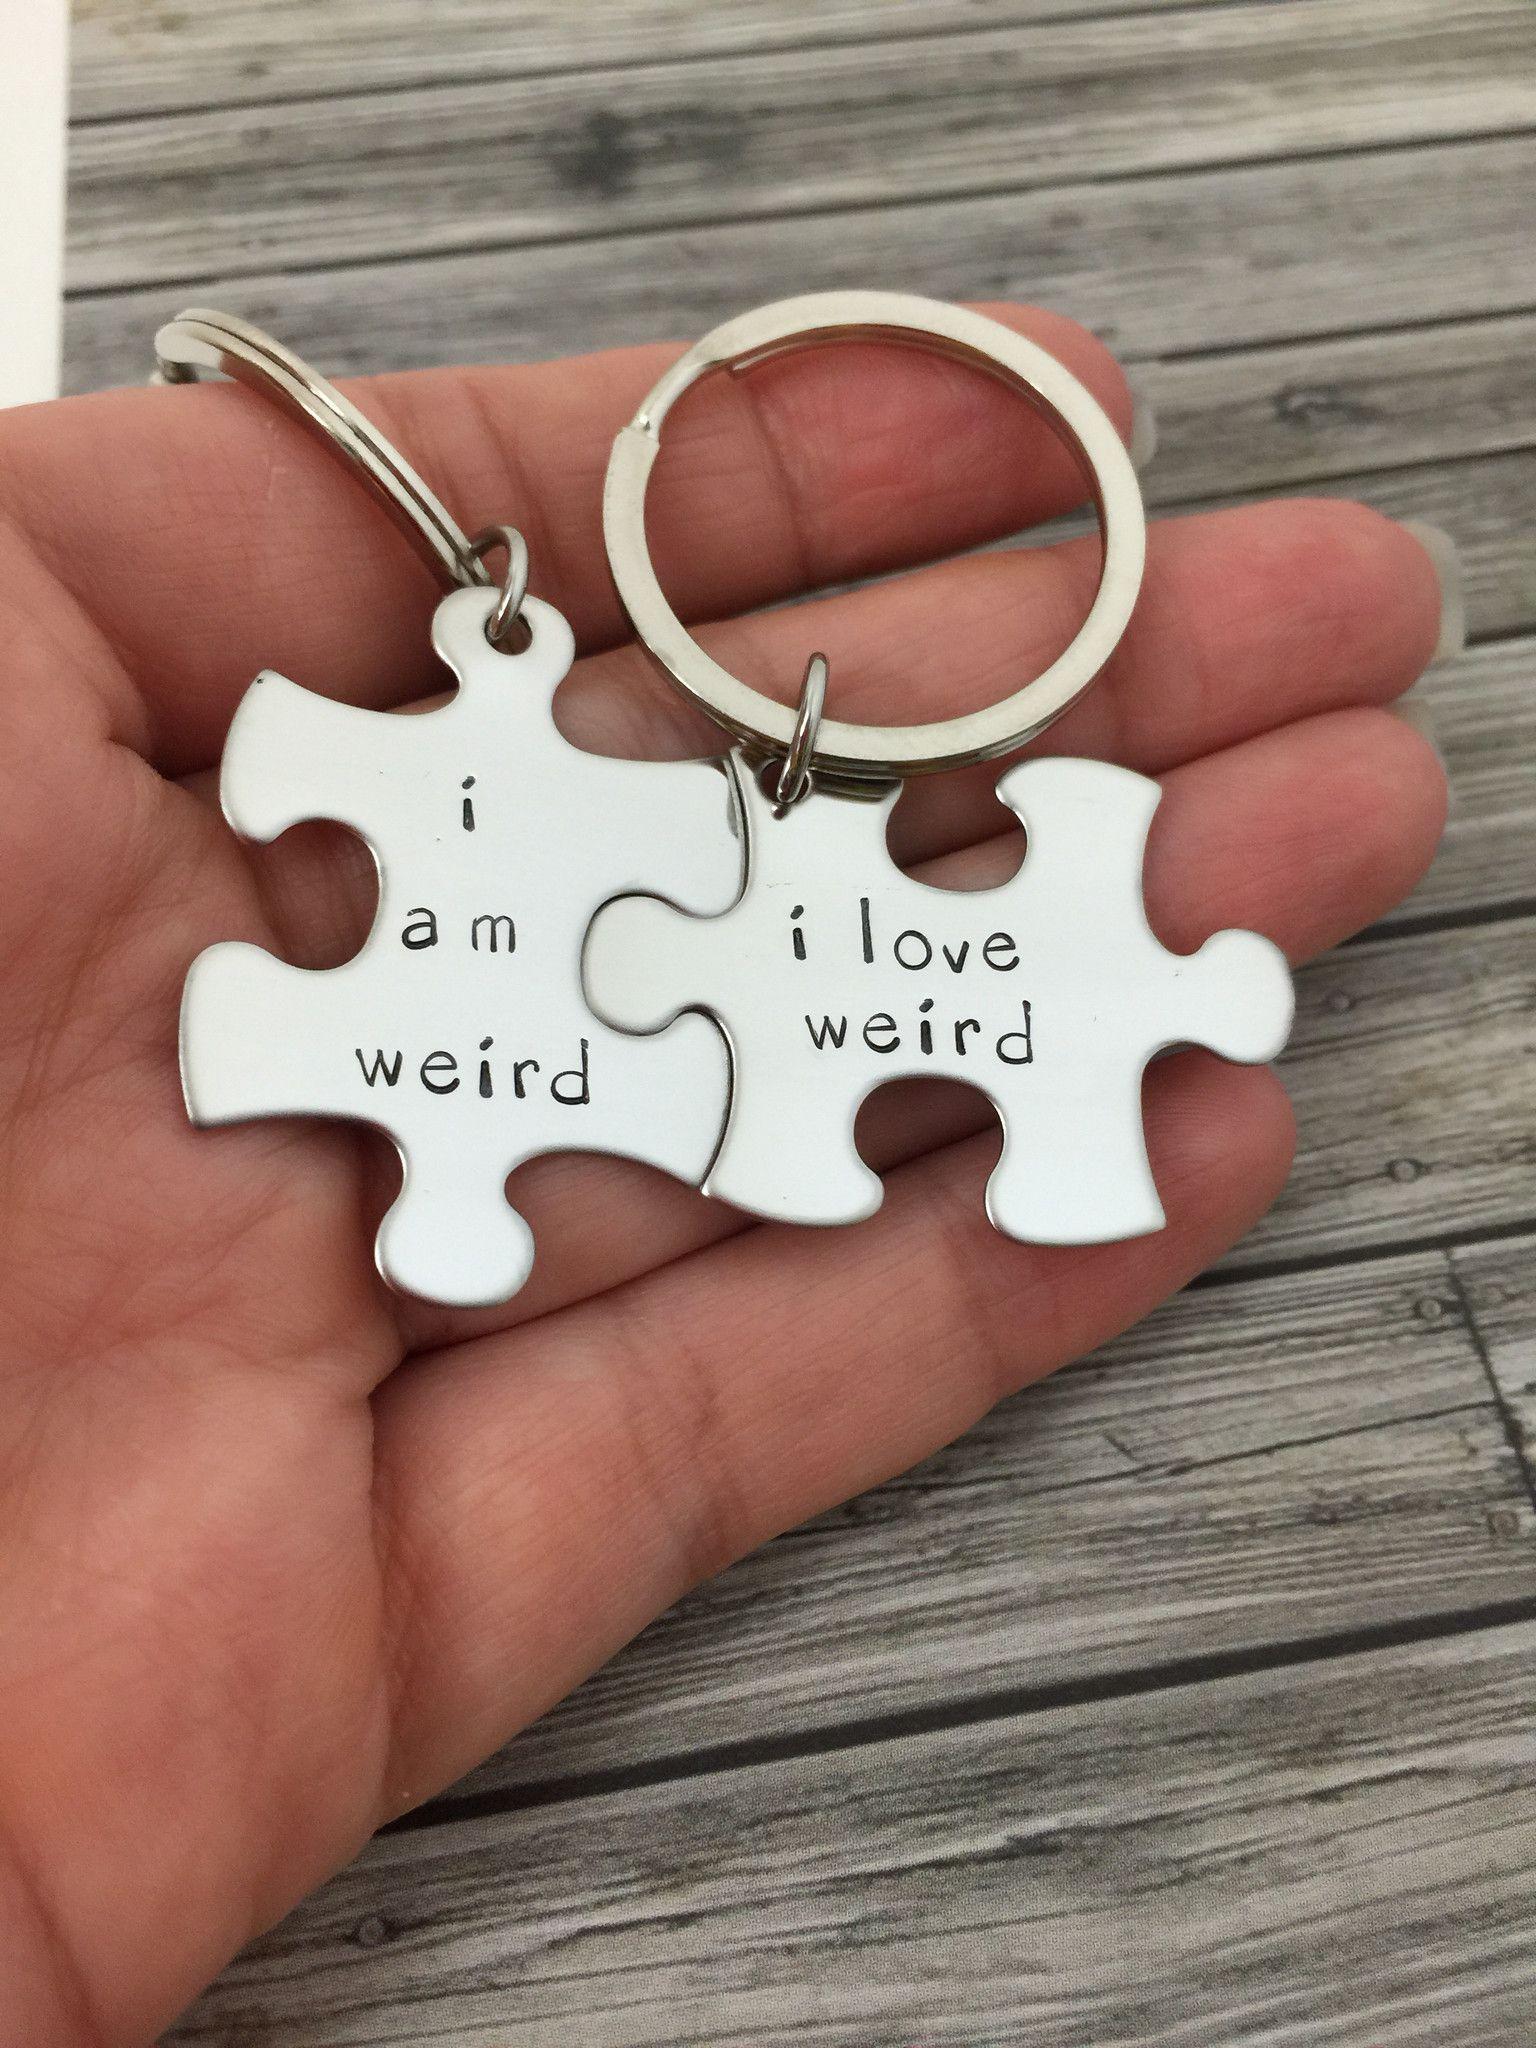 Couple Gift Ideas Your Boyfriend  I am weird I love weird Couples Keychains Couples Gift